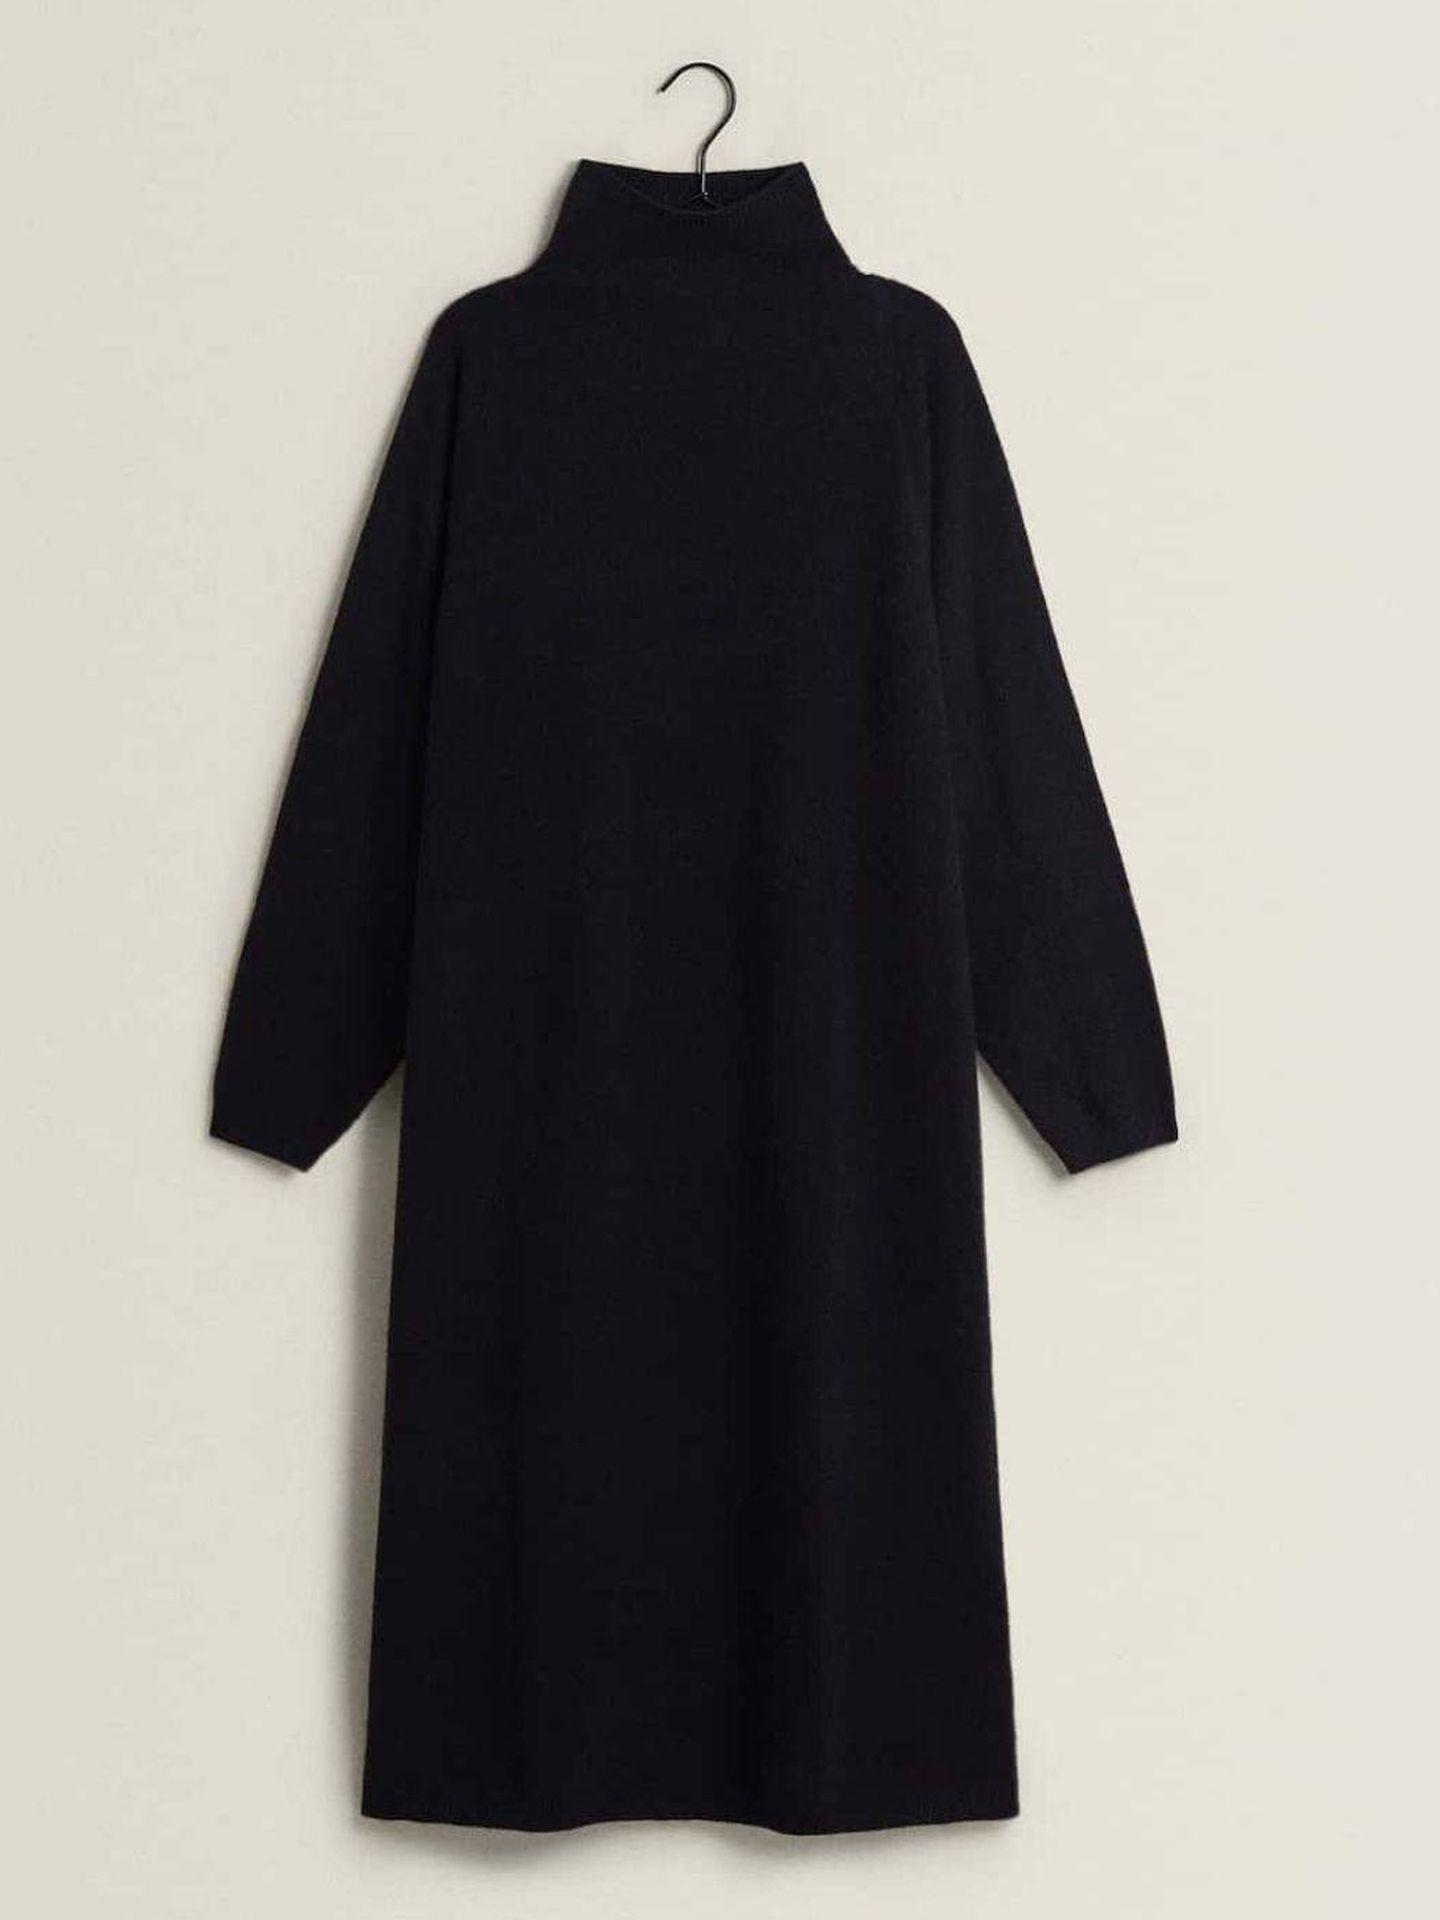 Vestido, de Zara Home